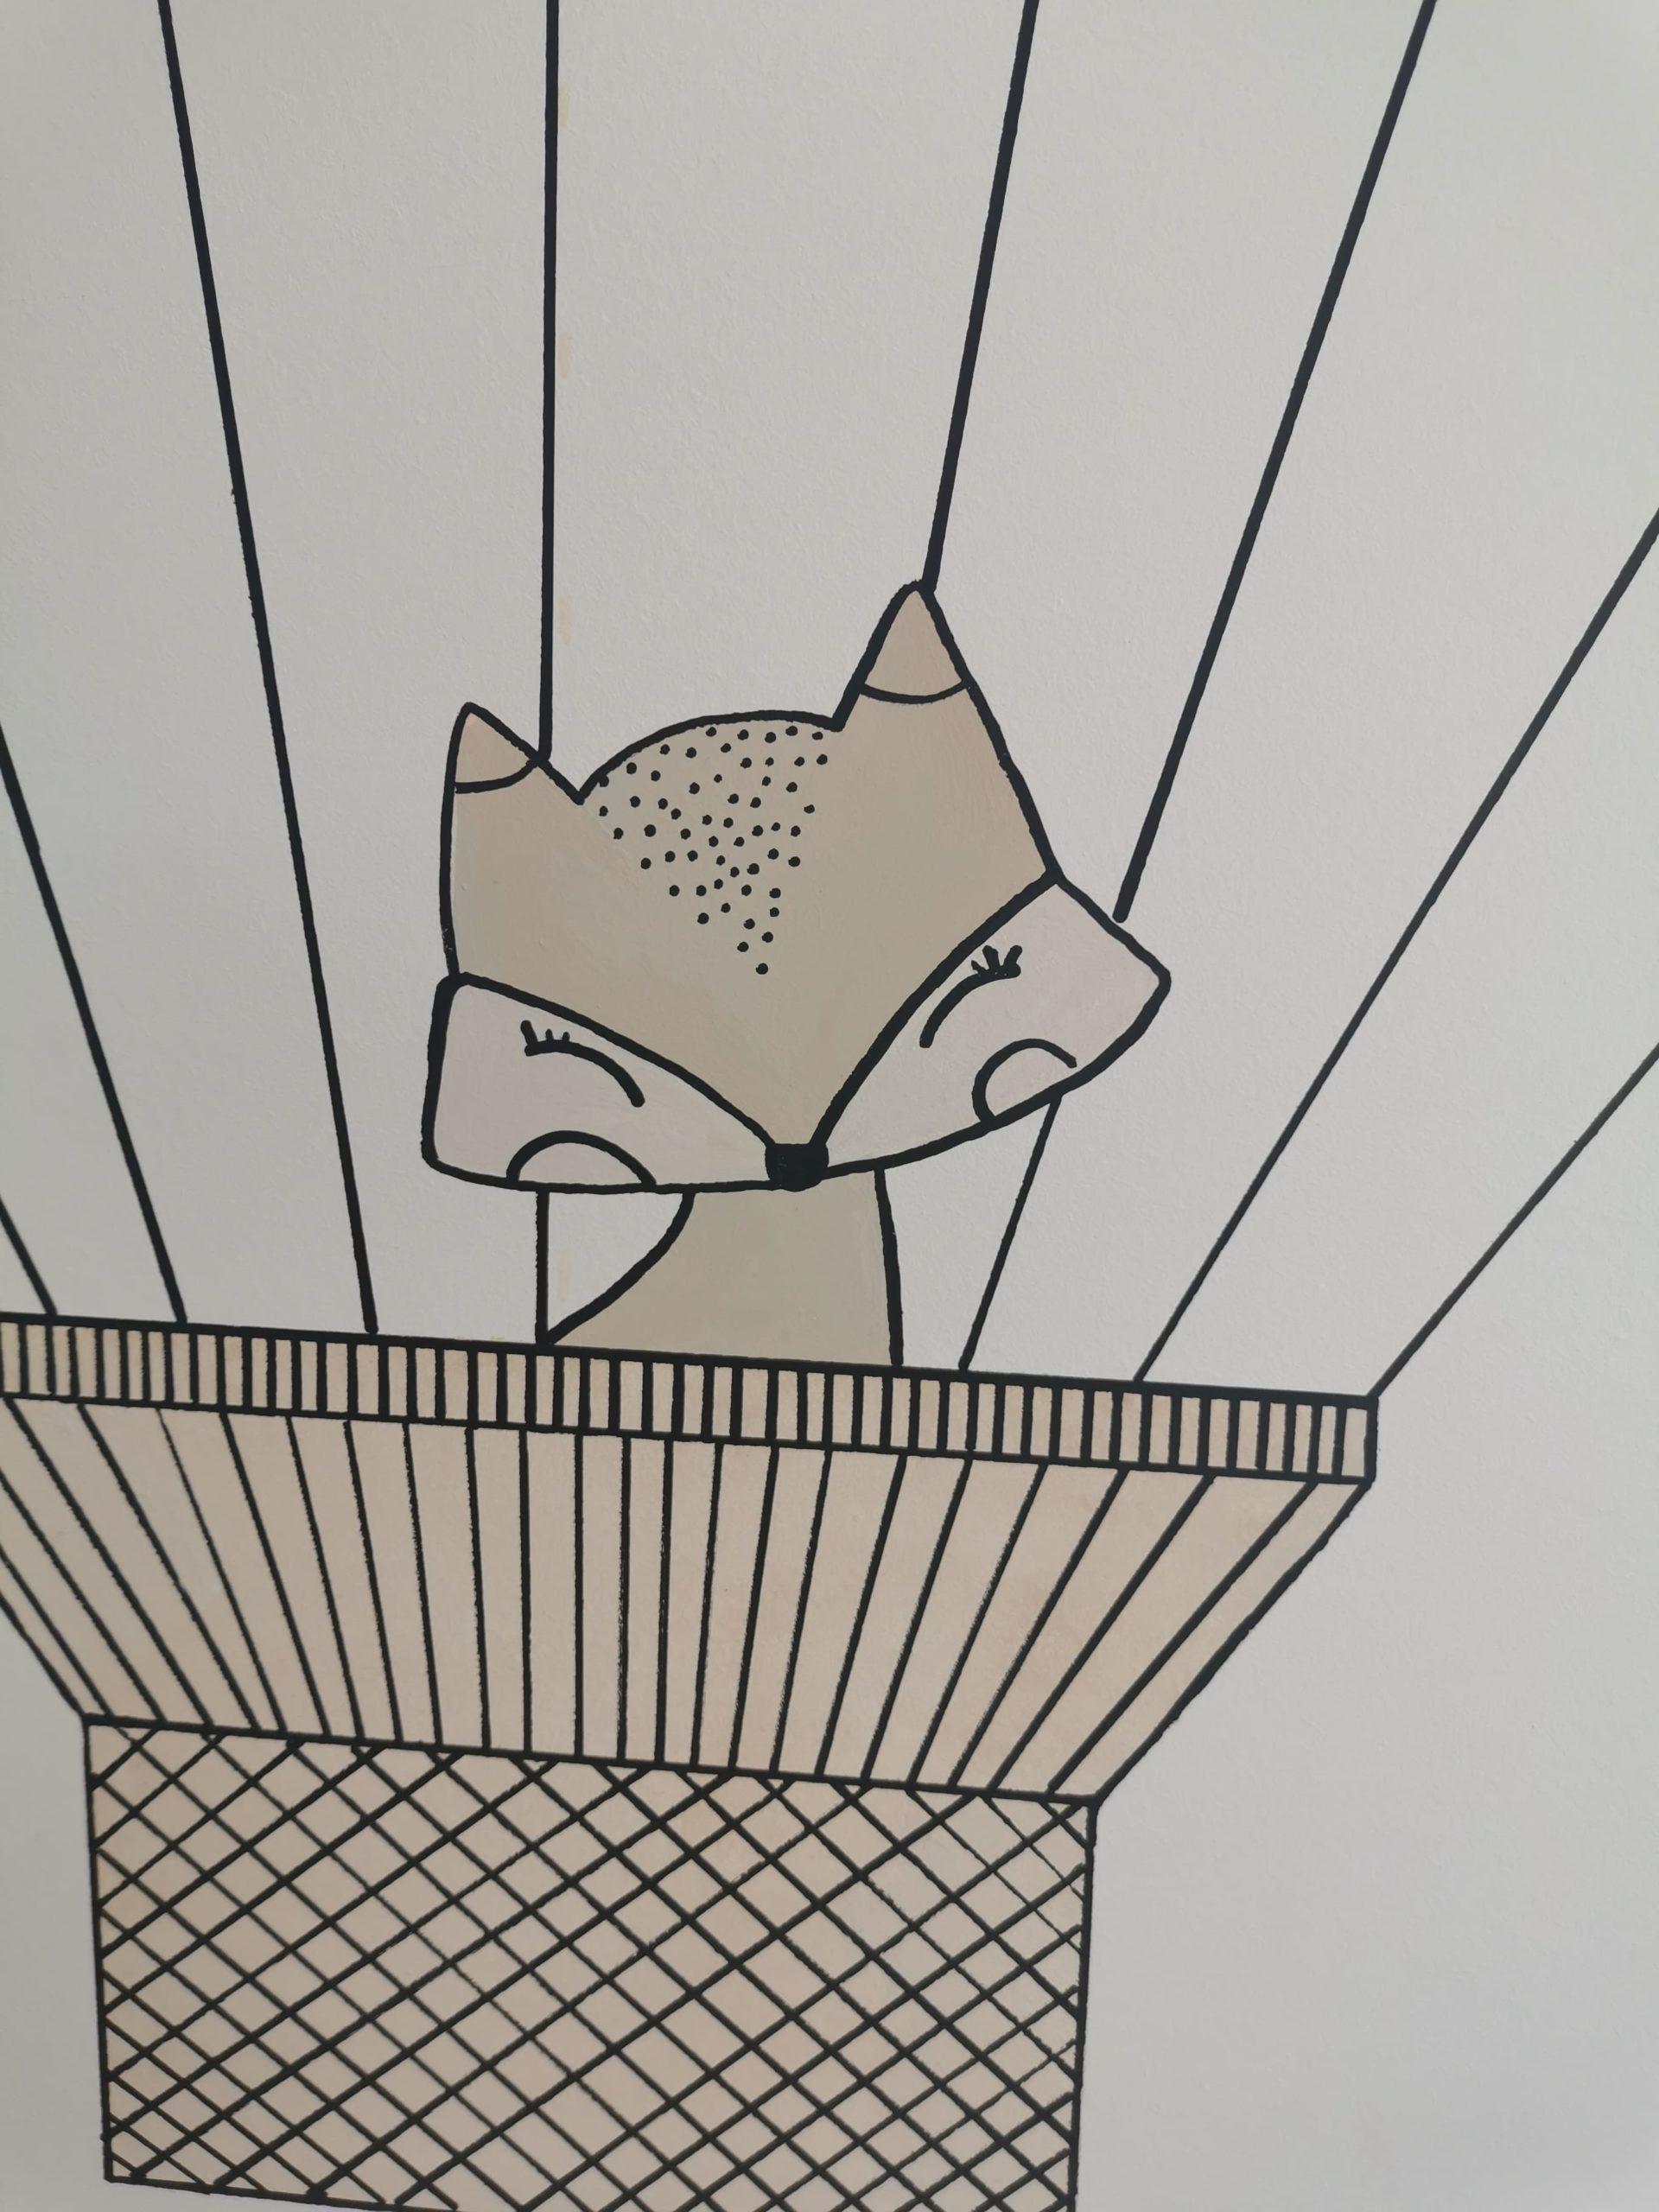 menine-kuryba-sienu-dekoravimas-ivairus-interjerai (25)